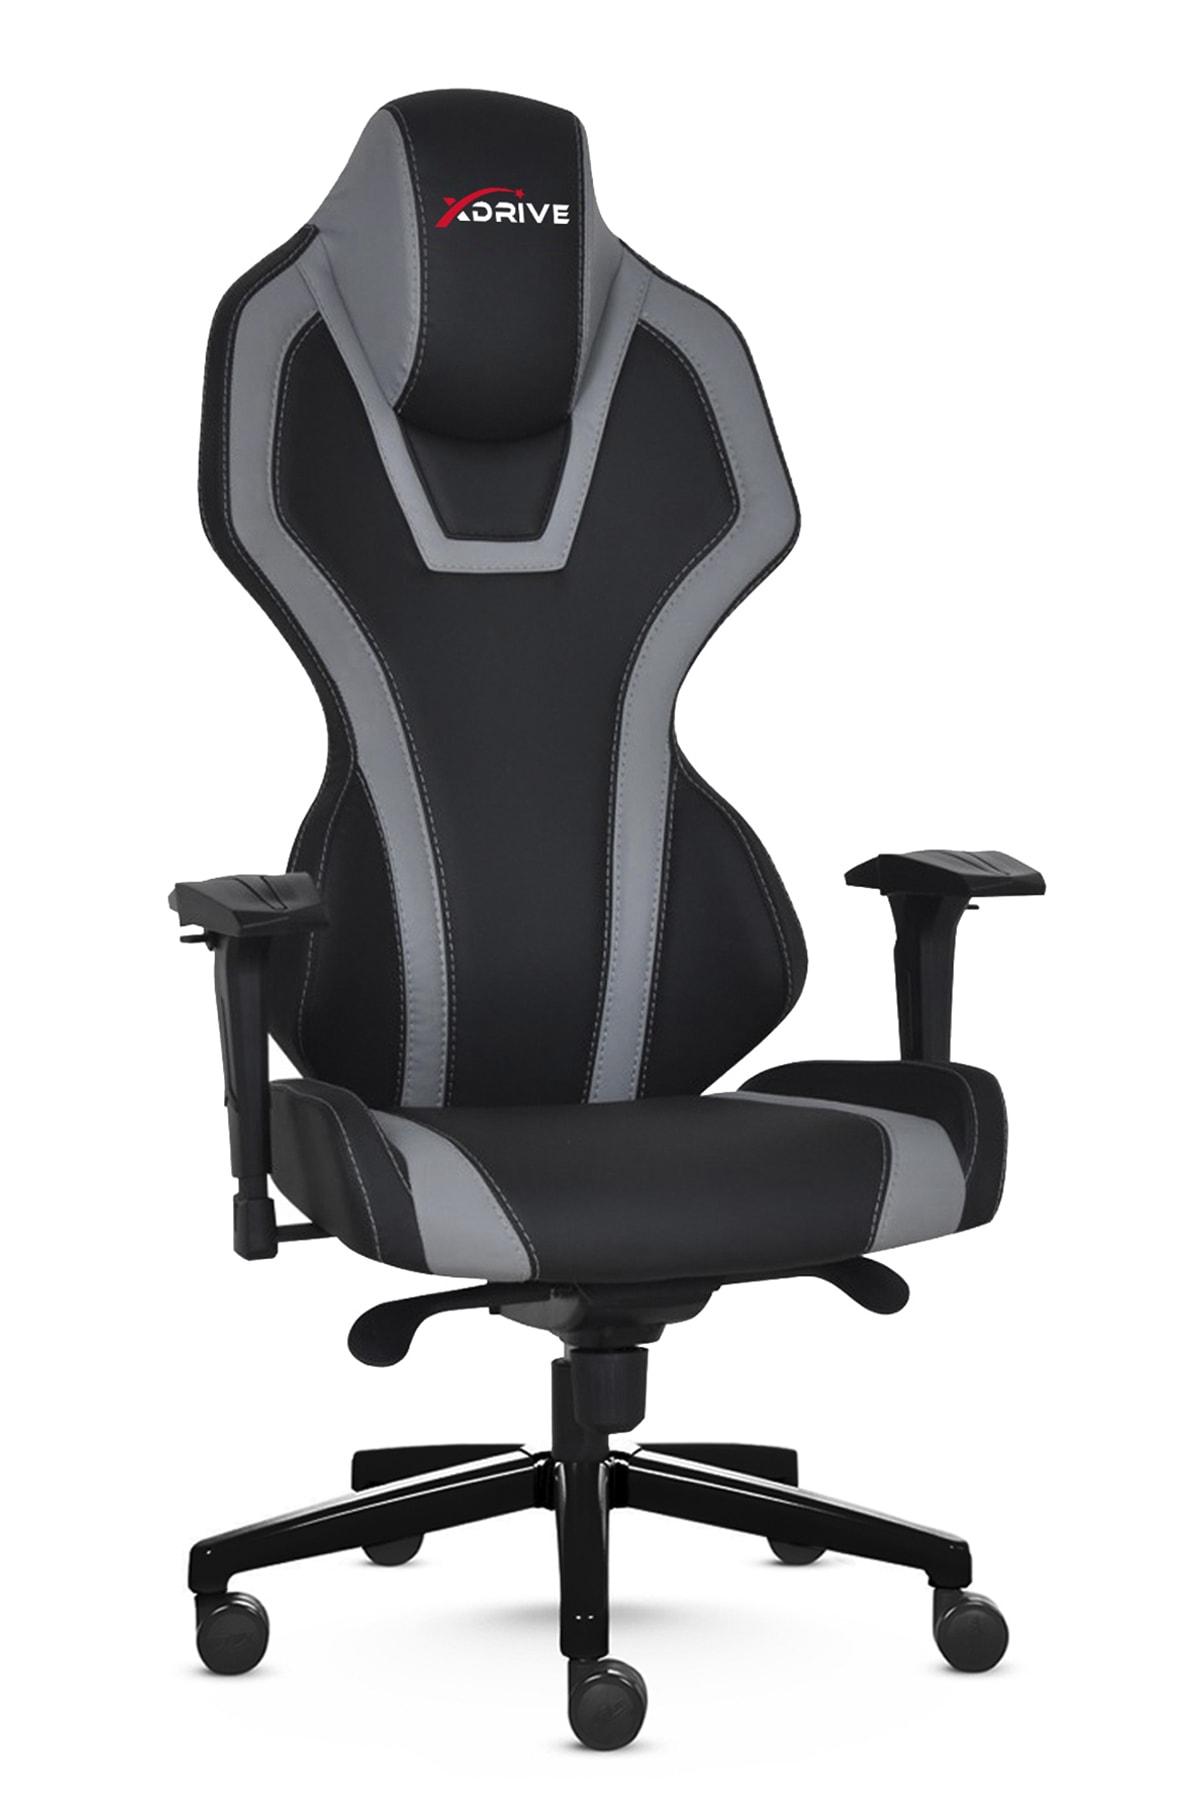 XDrive Bora Profesyonel Oyuncu Koltuğu Gri/siyah 1